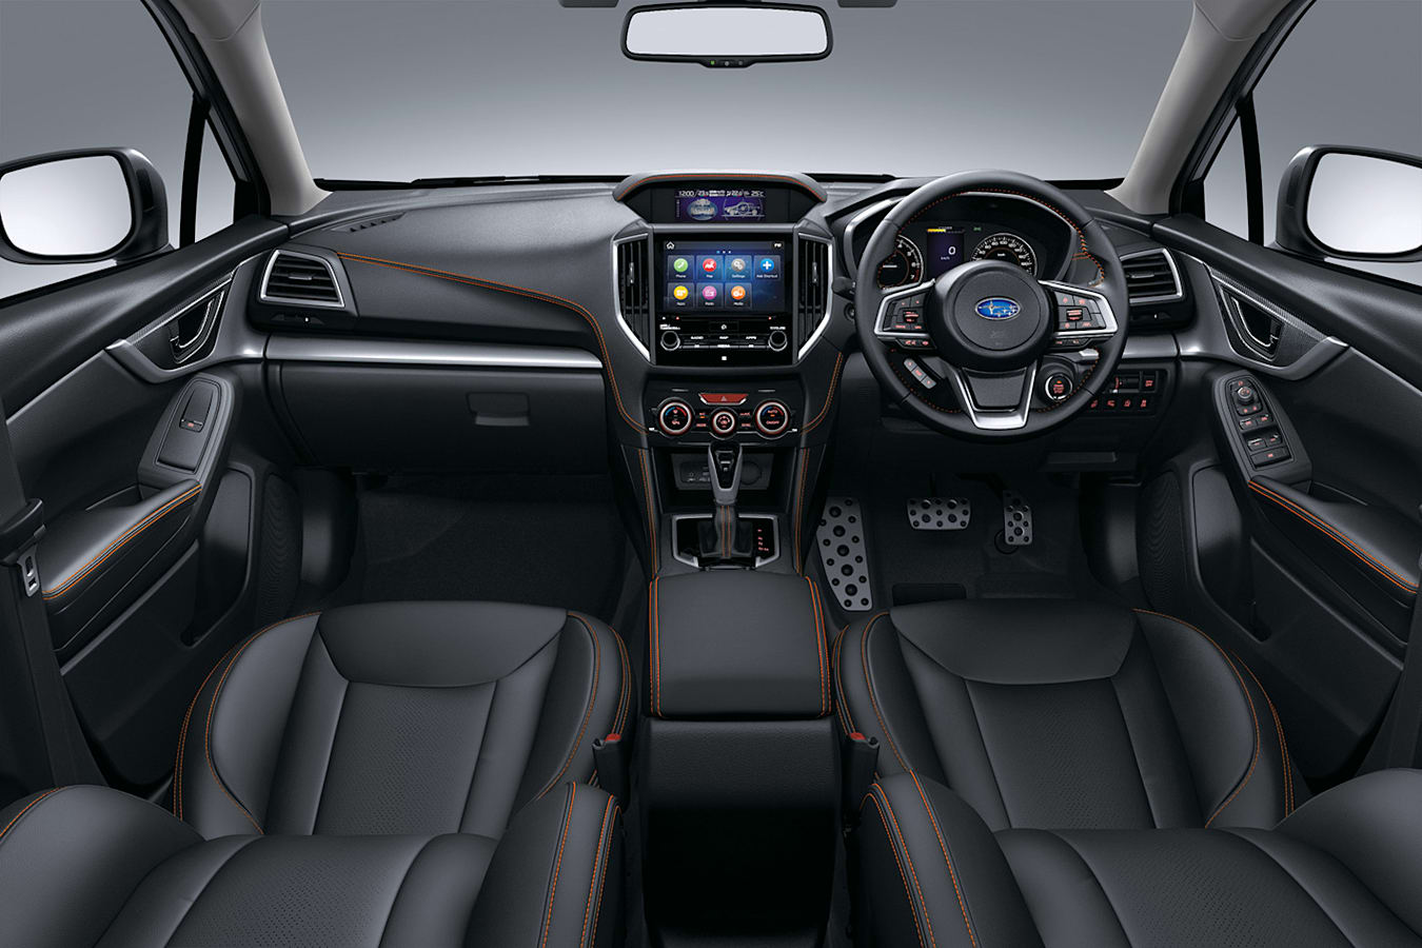 2021 Subaru XV 2.0i-S INTERIOR